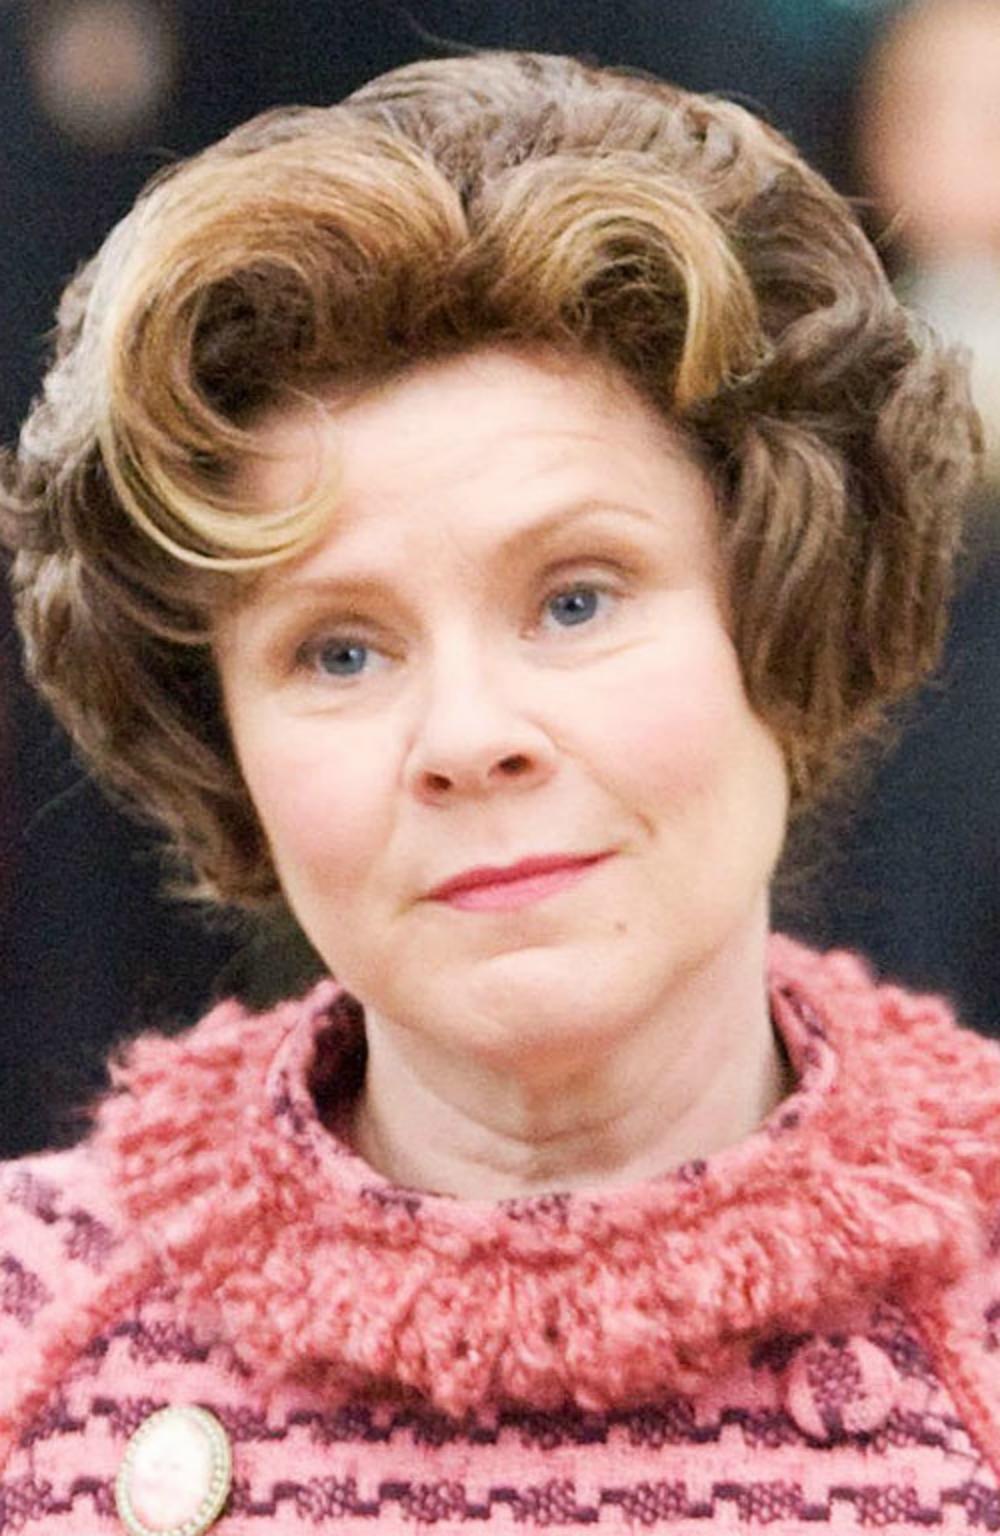 Dolores Umbridge Google Search Dolores Umbridge Harry Potter Umbridge Imelda Staunton